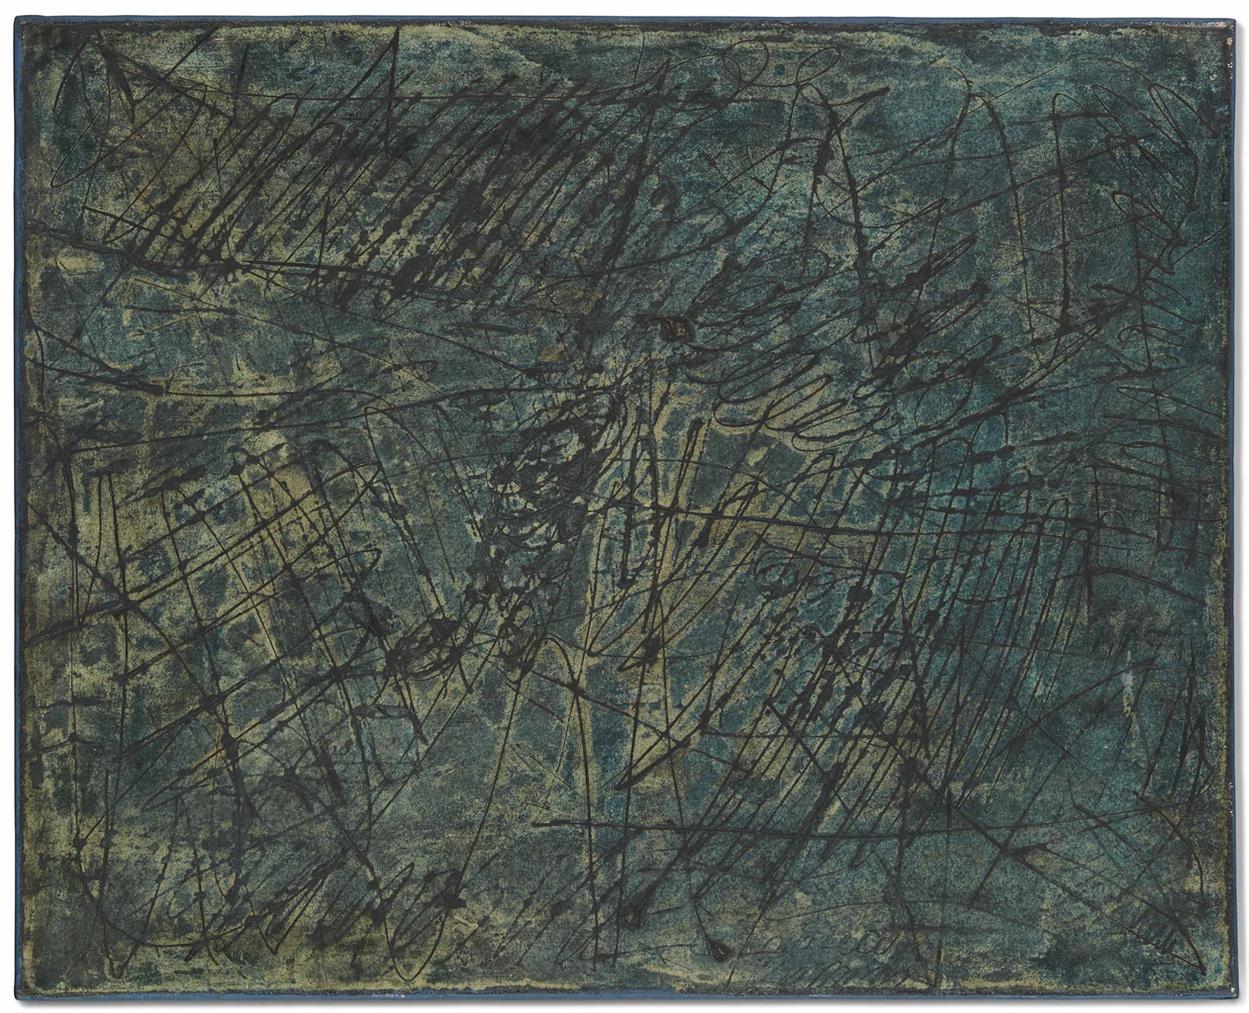 Georges Noel - Inoui-Bleu-1960